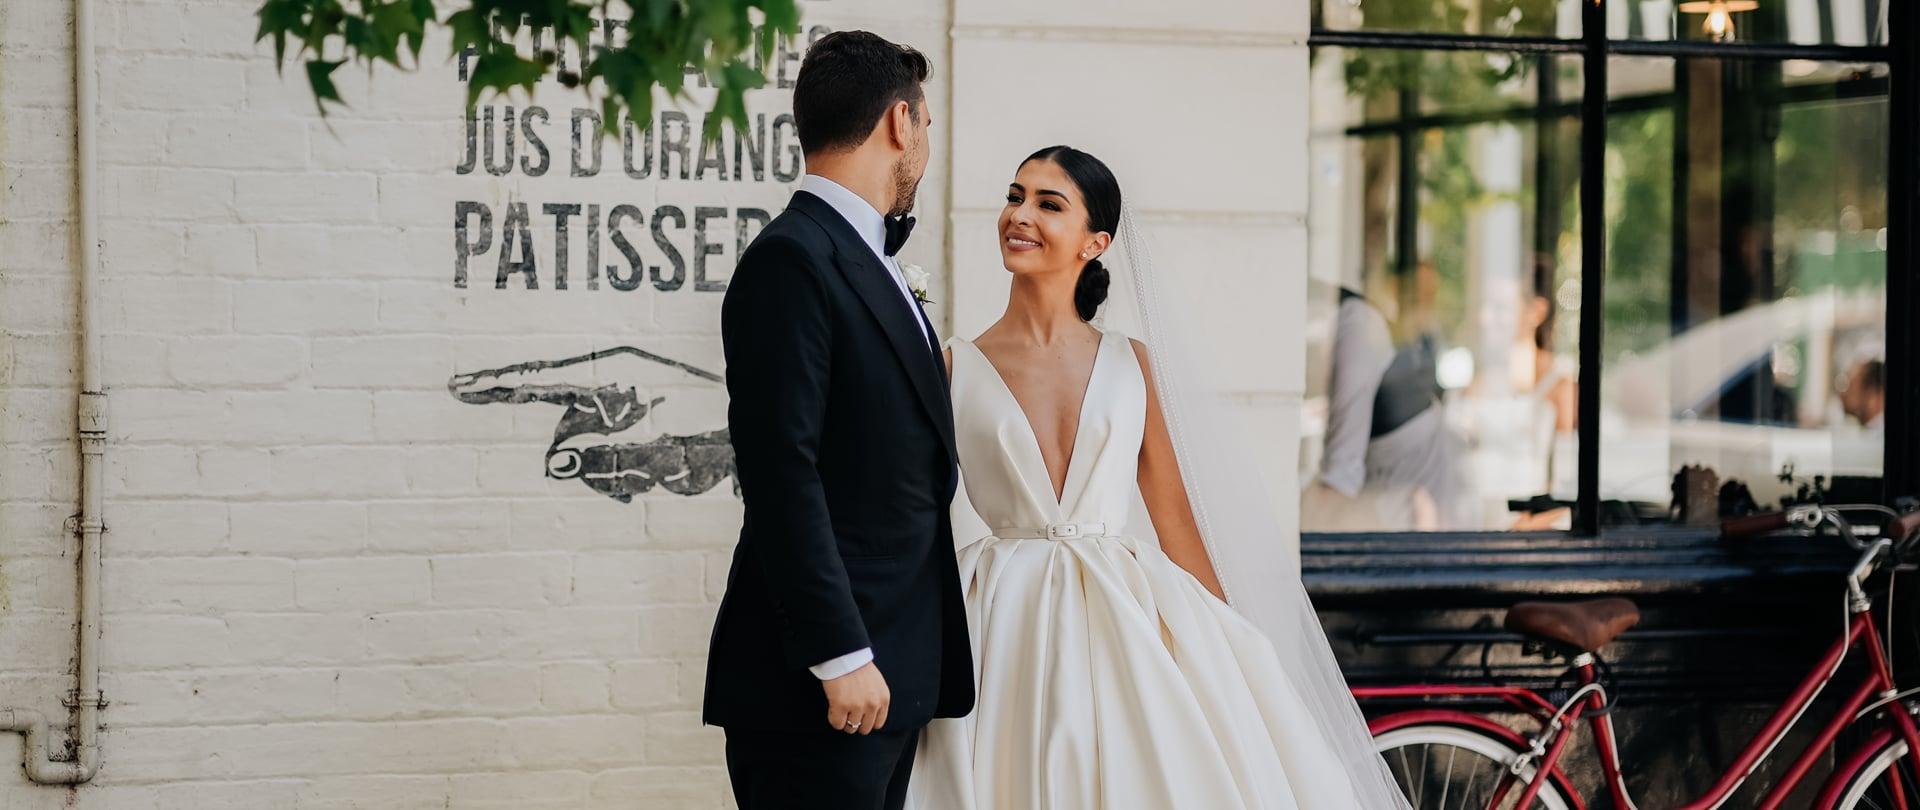 Michelle & William Wedding Video Filmed at Australia